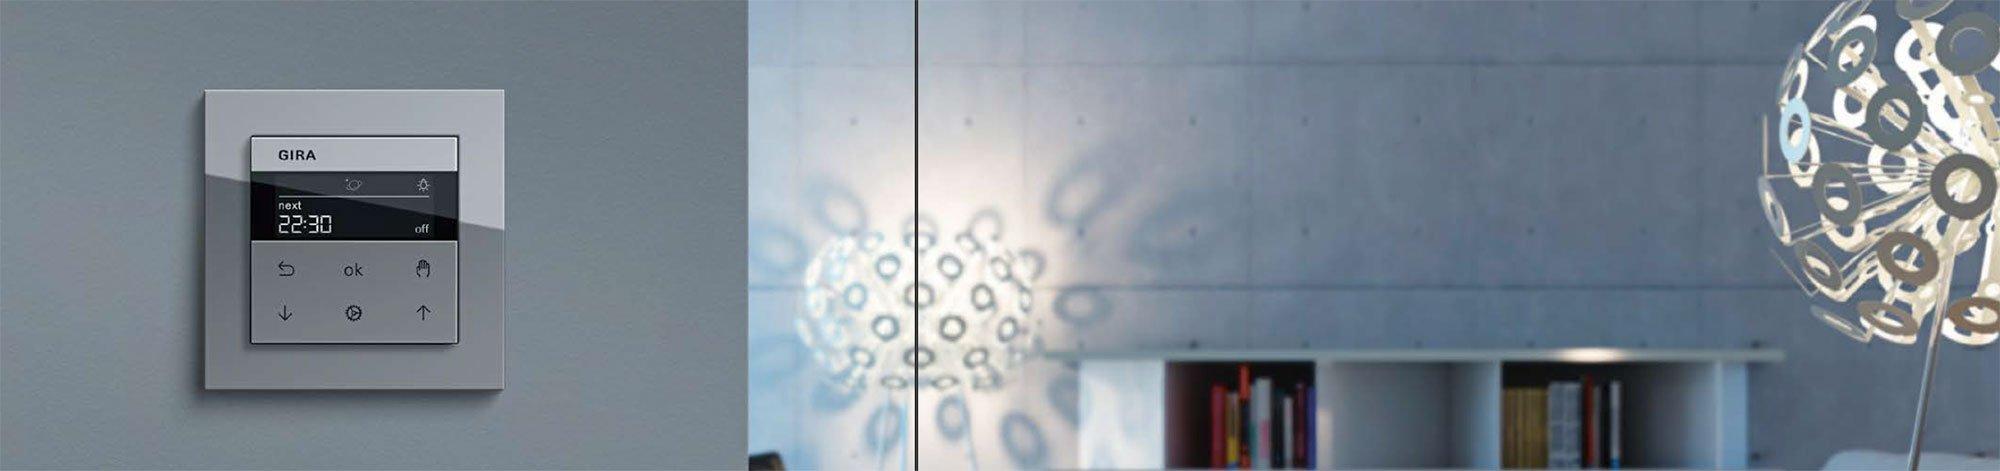 Gira-Smart-Home-Light-Heating-Installers